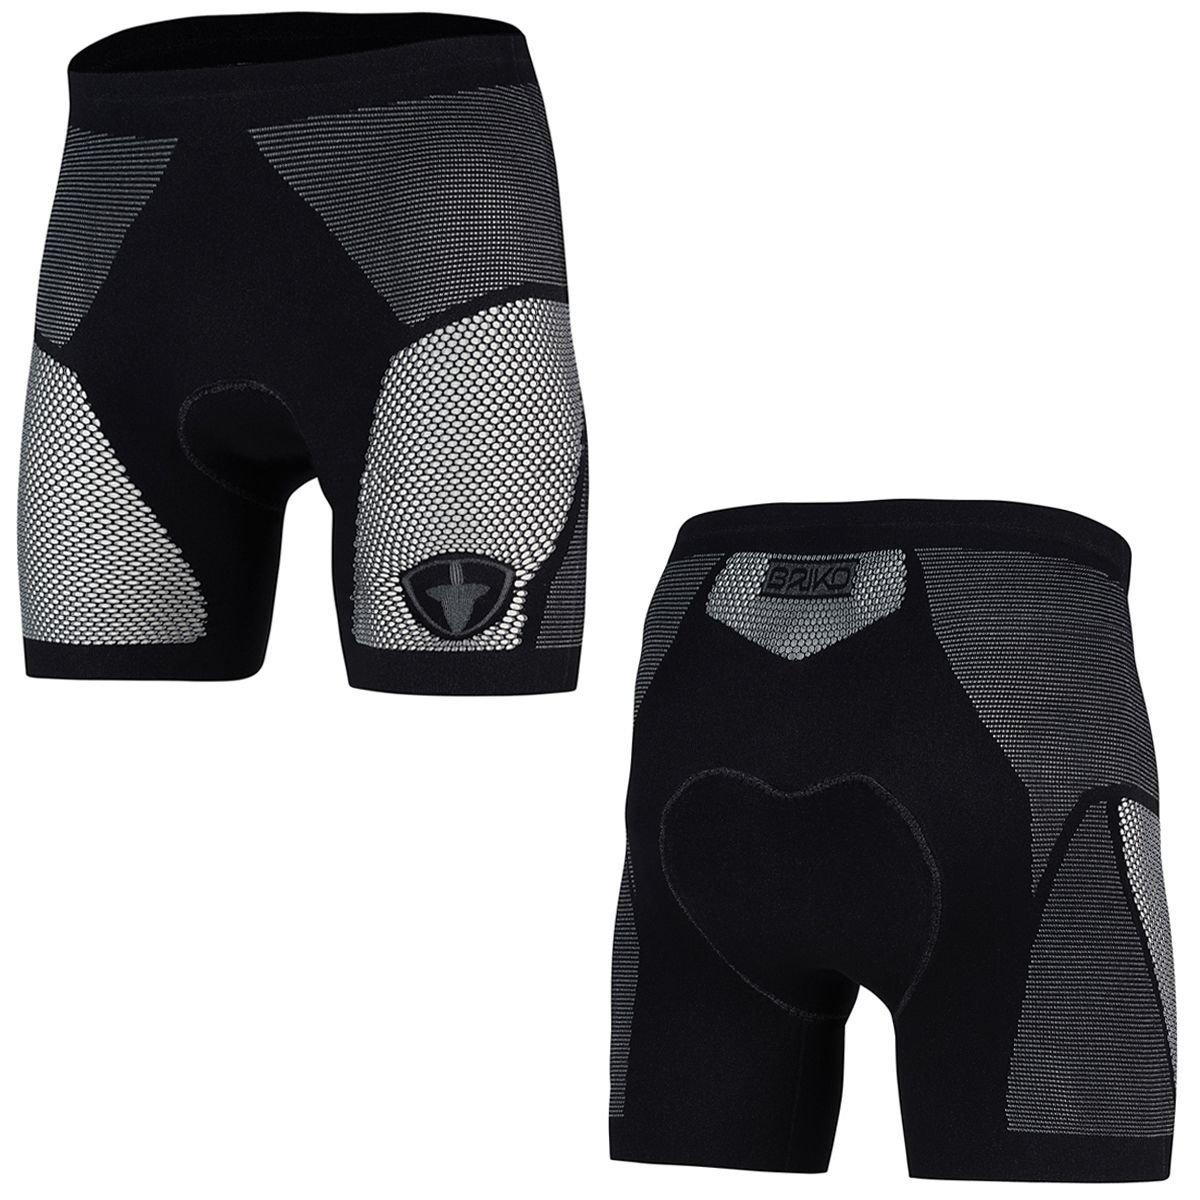 Briko DRYARN Pad Inner Shorts Unterwäsche